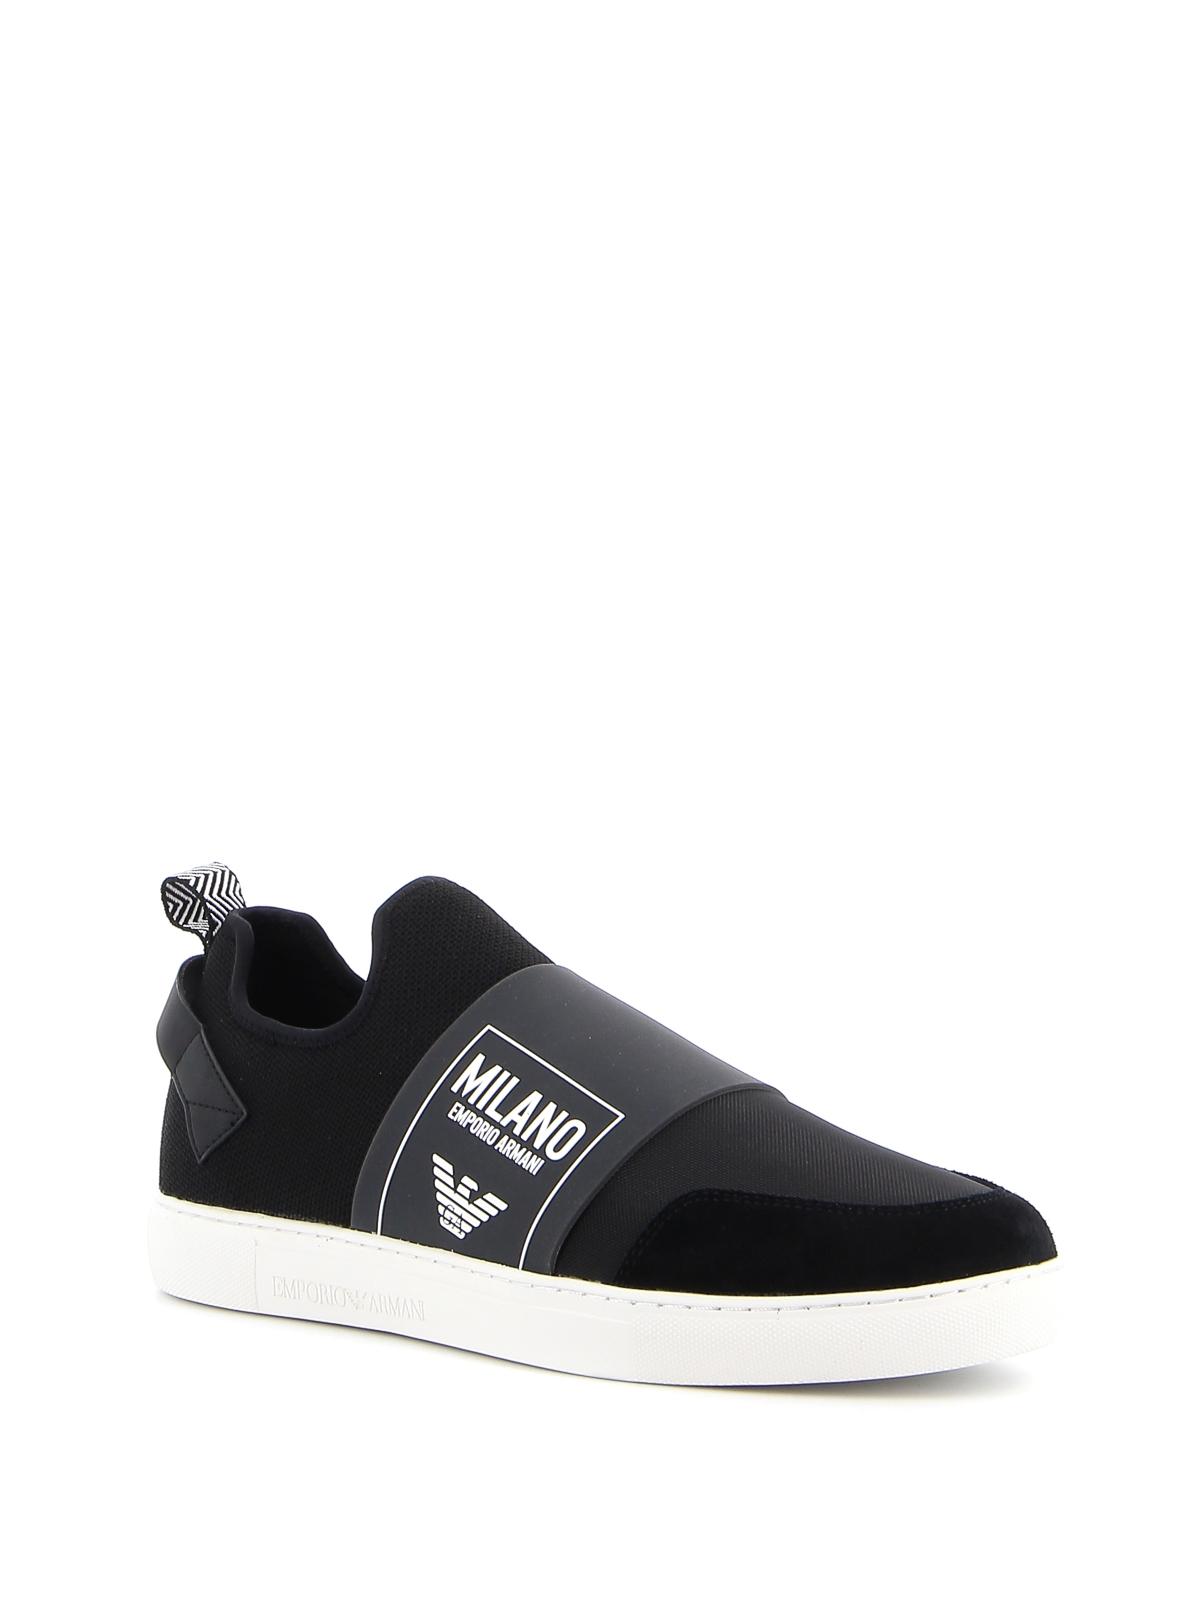 Emporio Armani - Slip-on sneakers